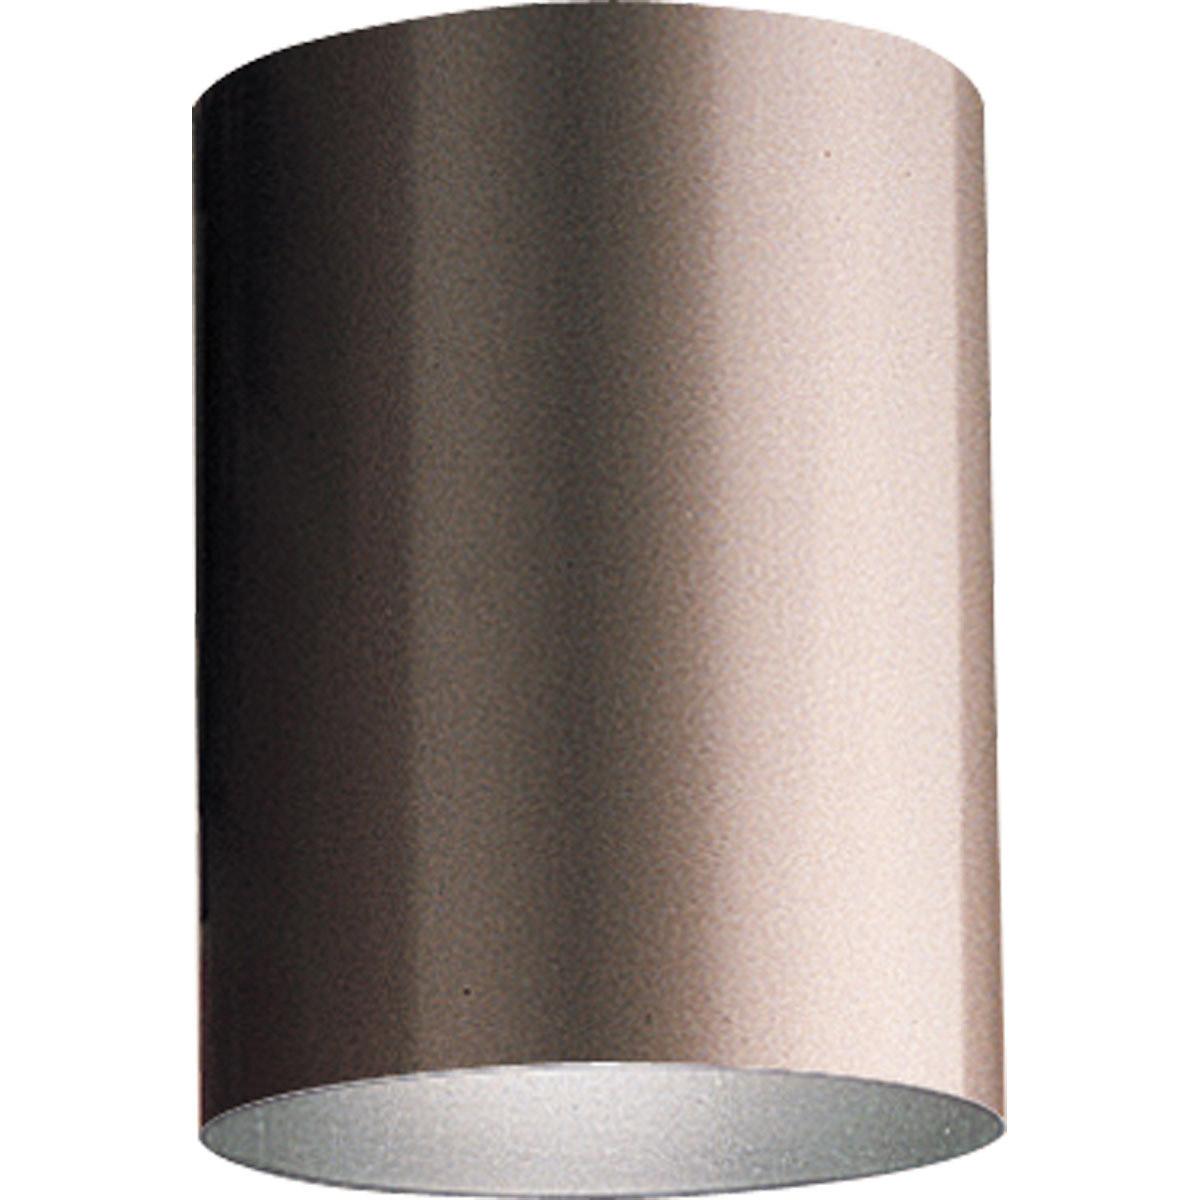 lighting close to ceiling light fixtures progress lighting p5774